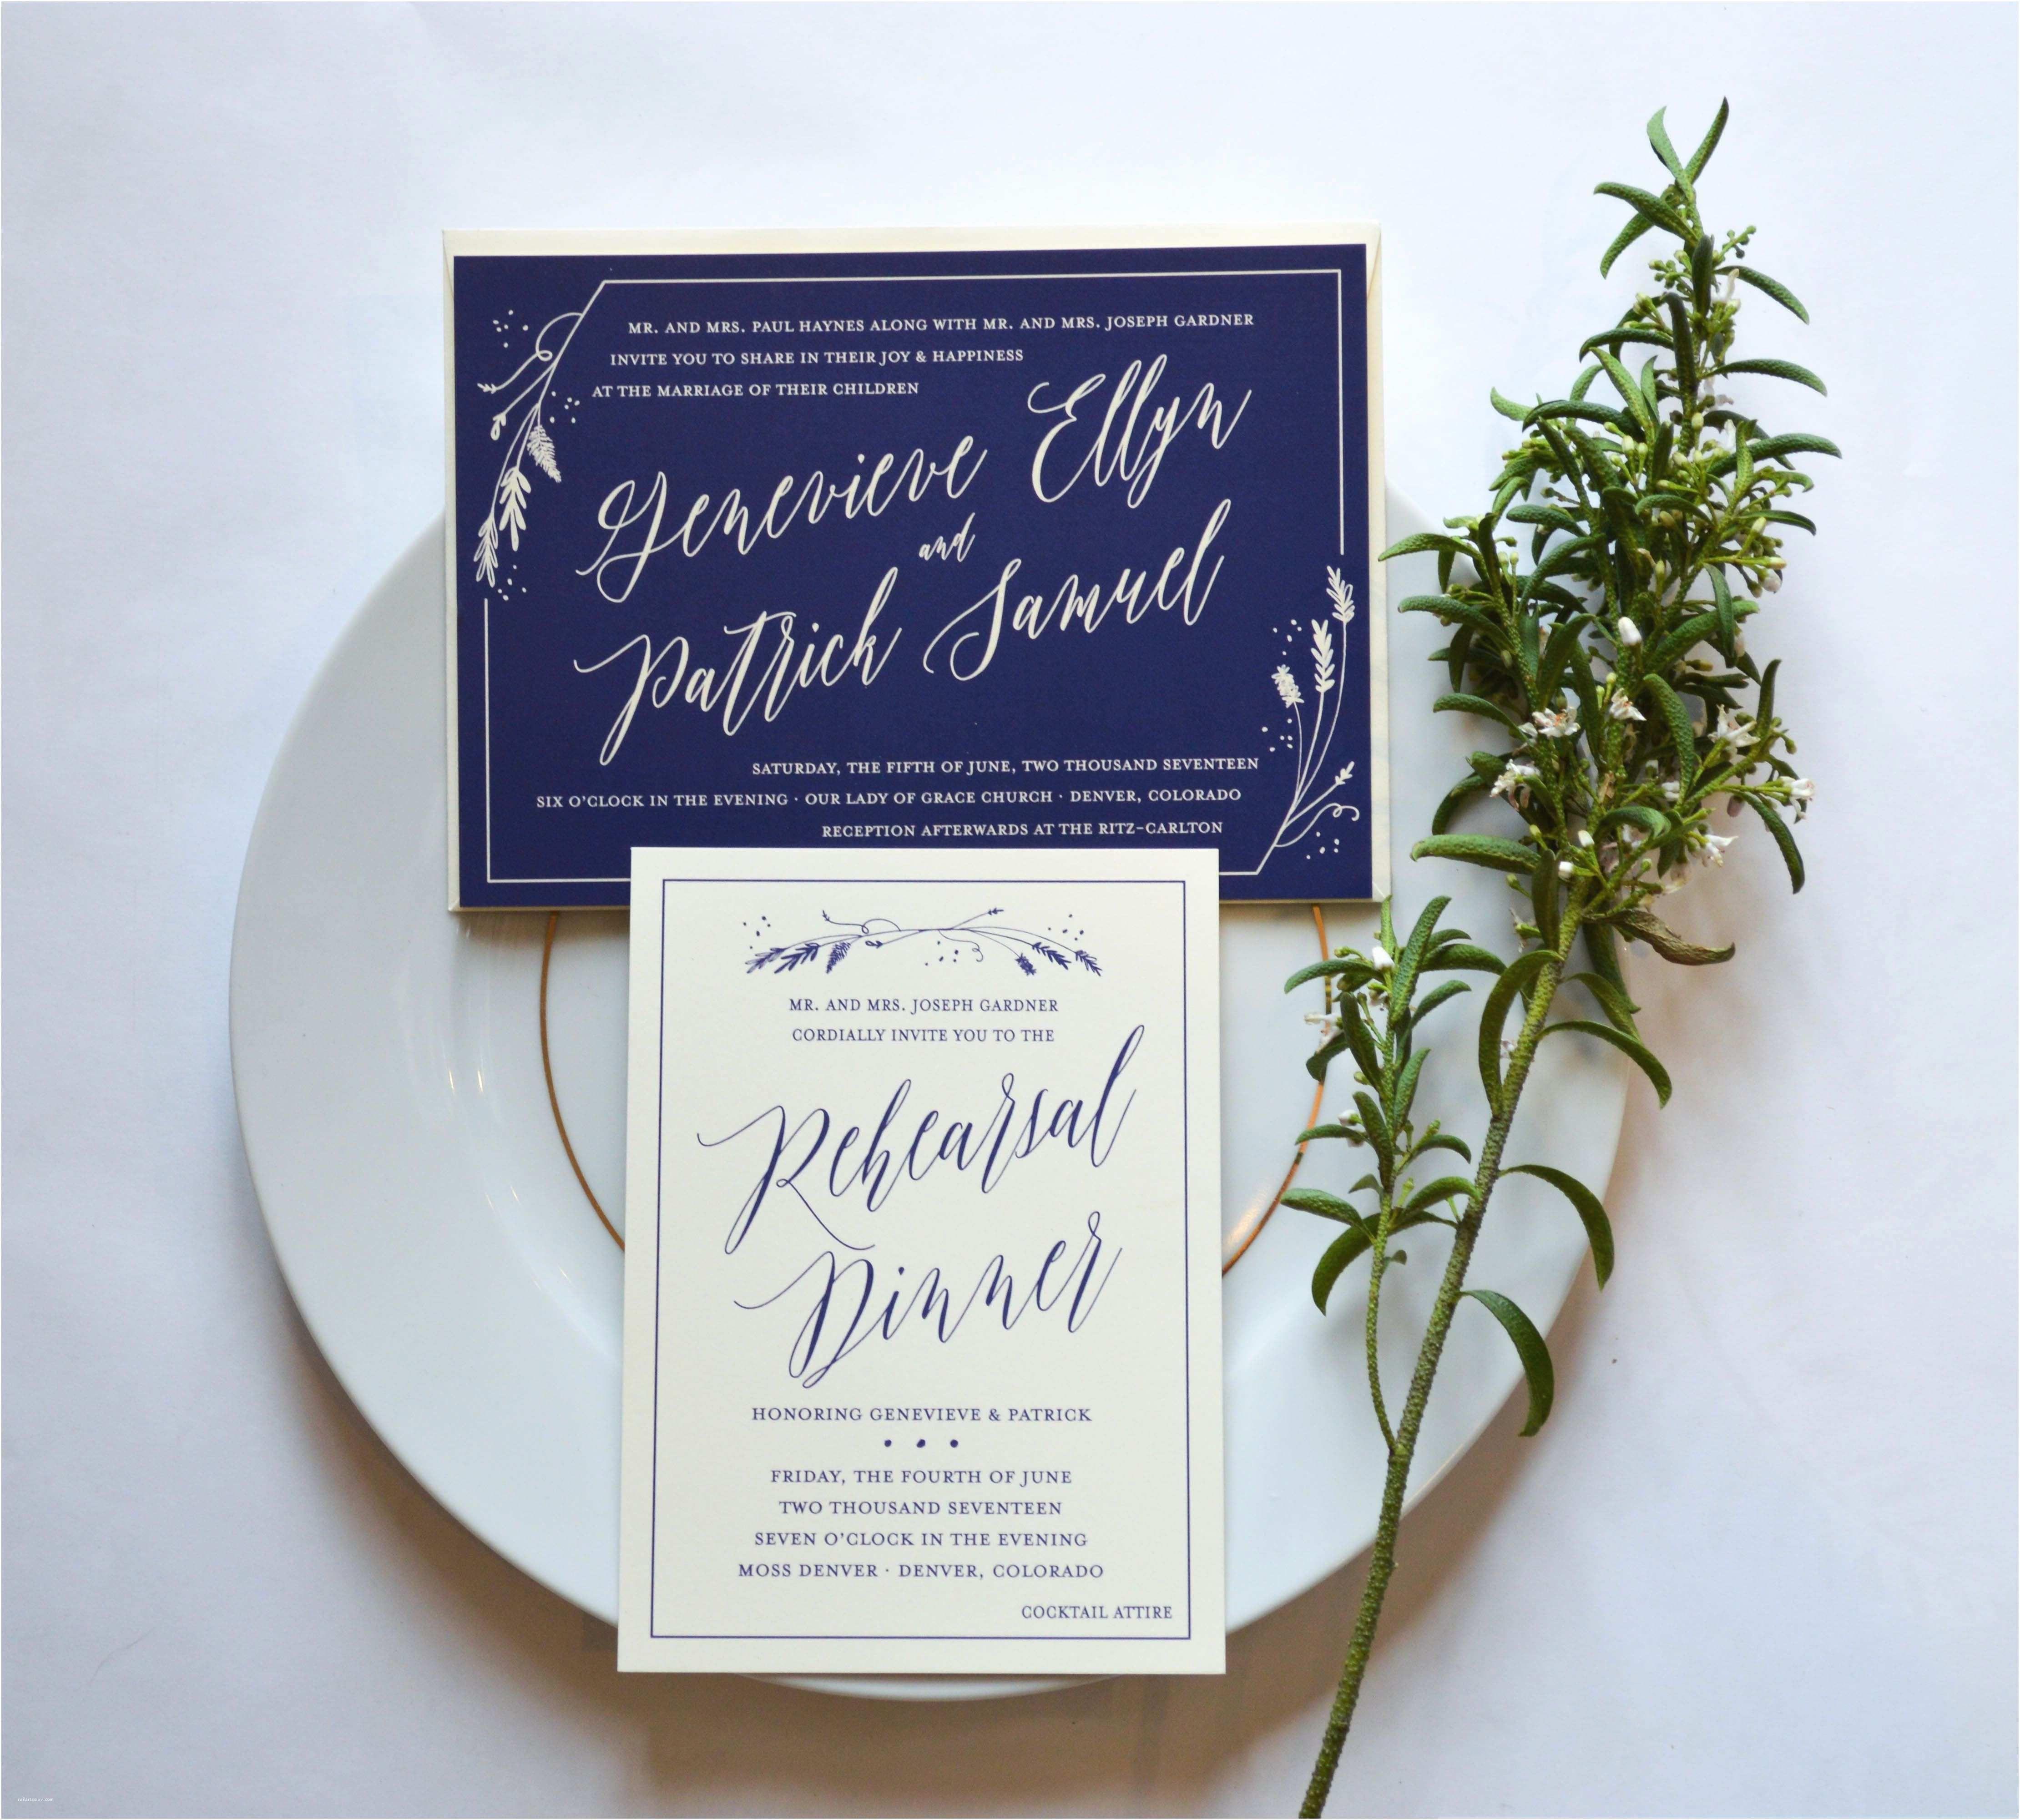 seal and send wedding invitations vistaprint minted